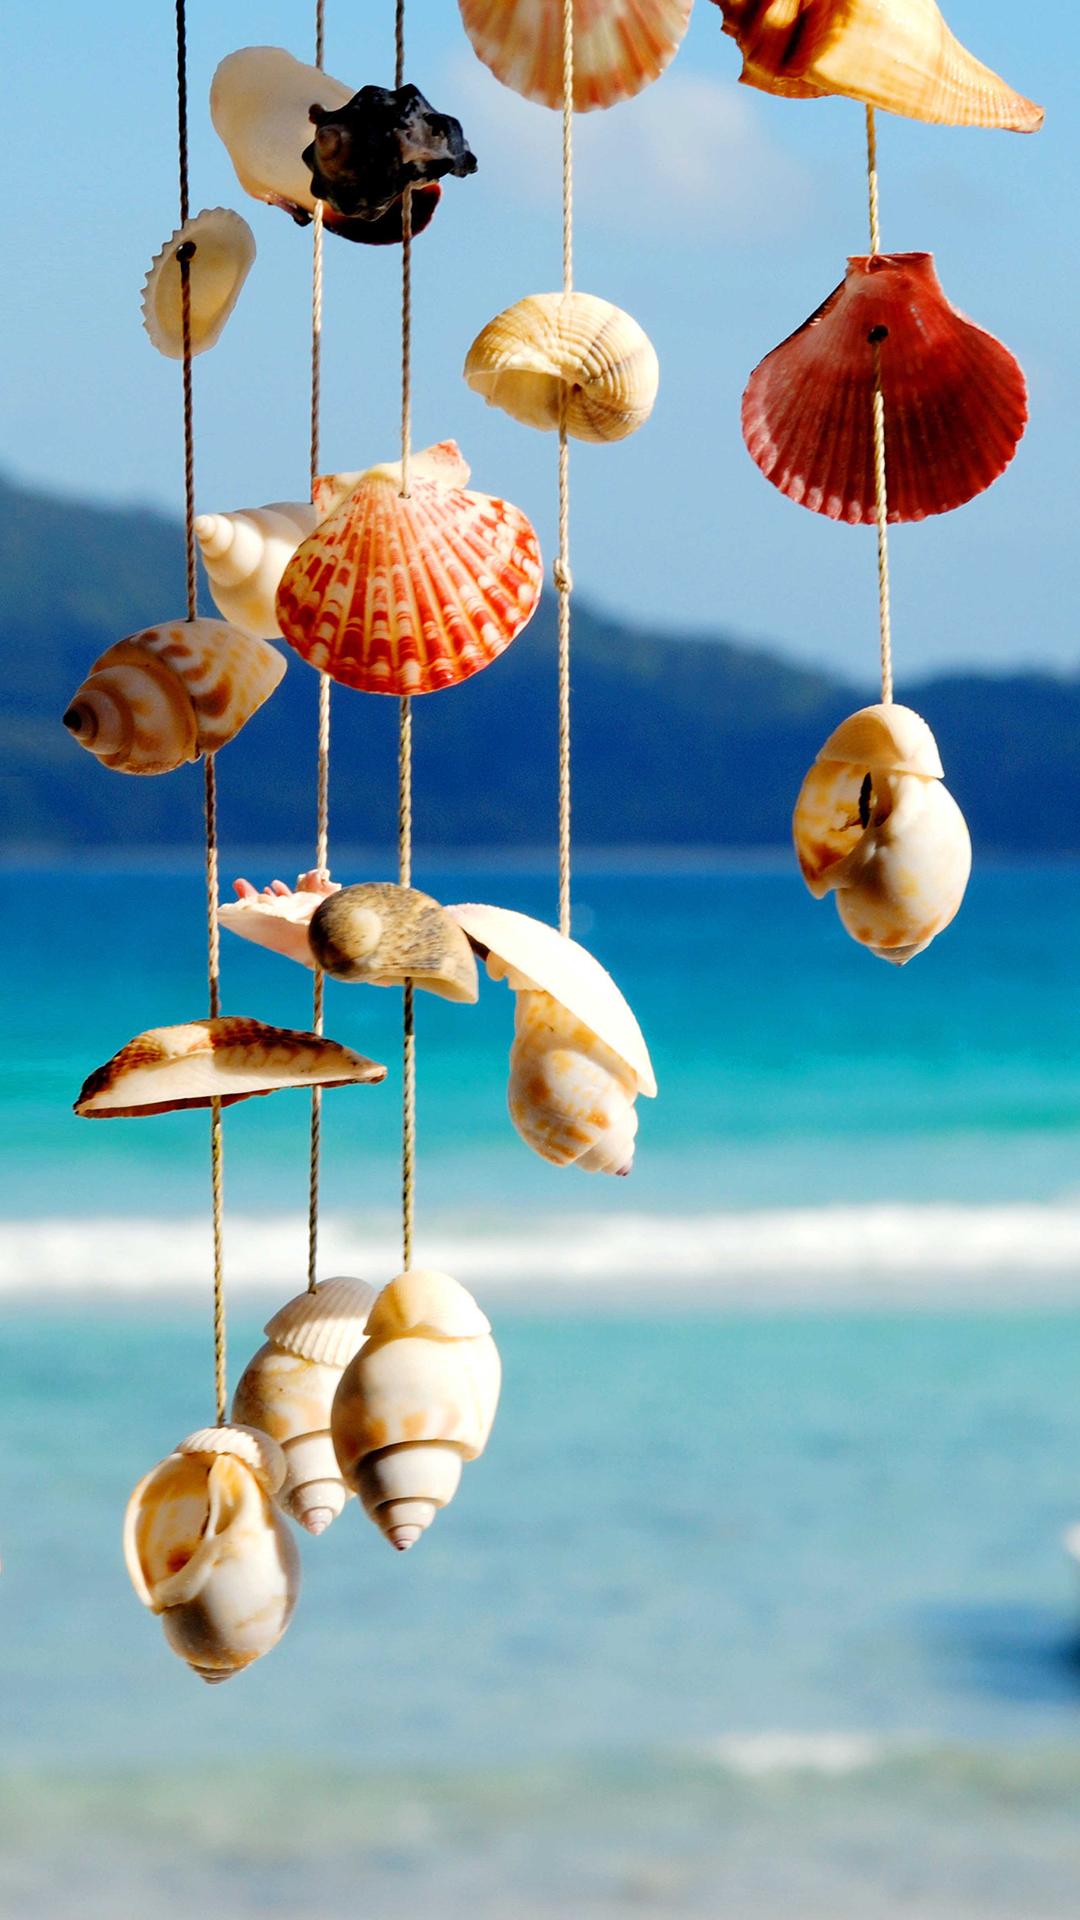 Wallpaper clipart chemistry Creative Star Art Creative Shells